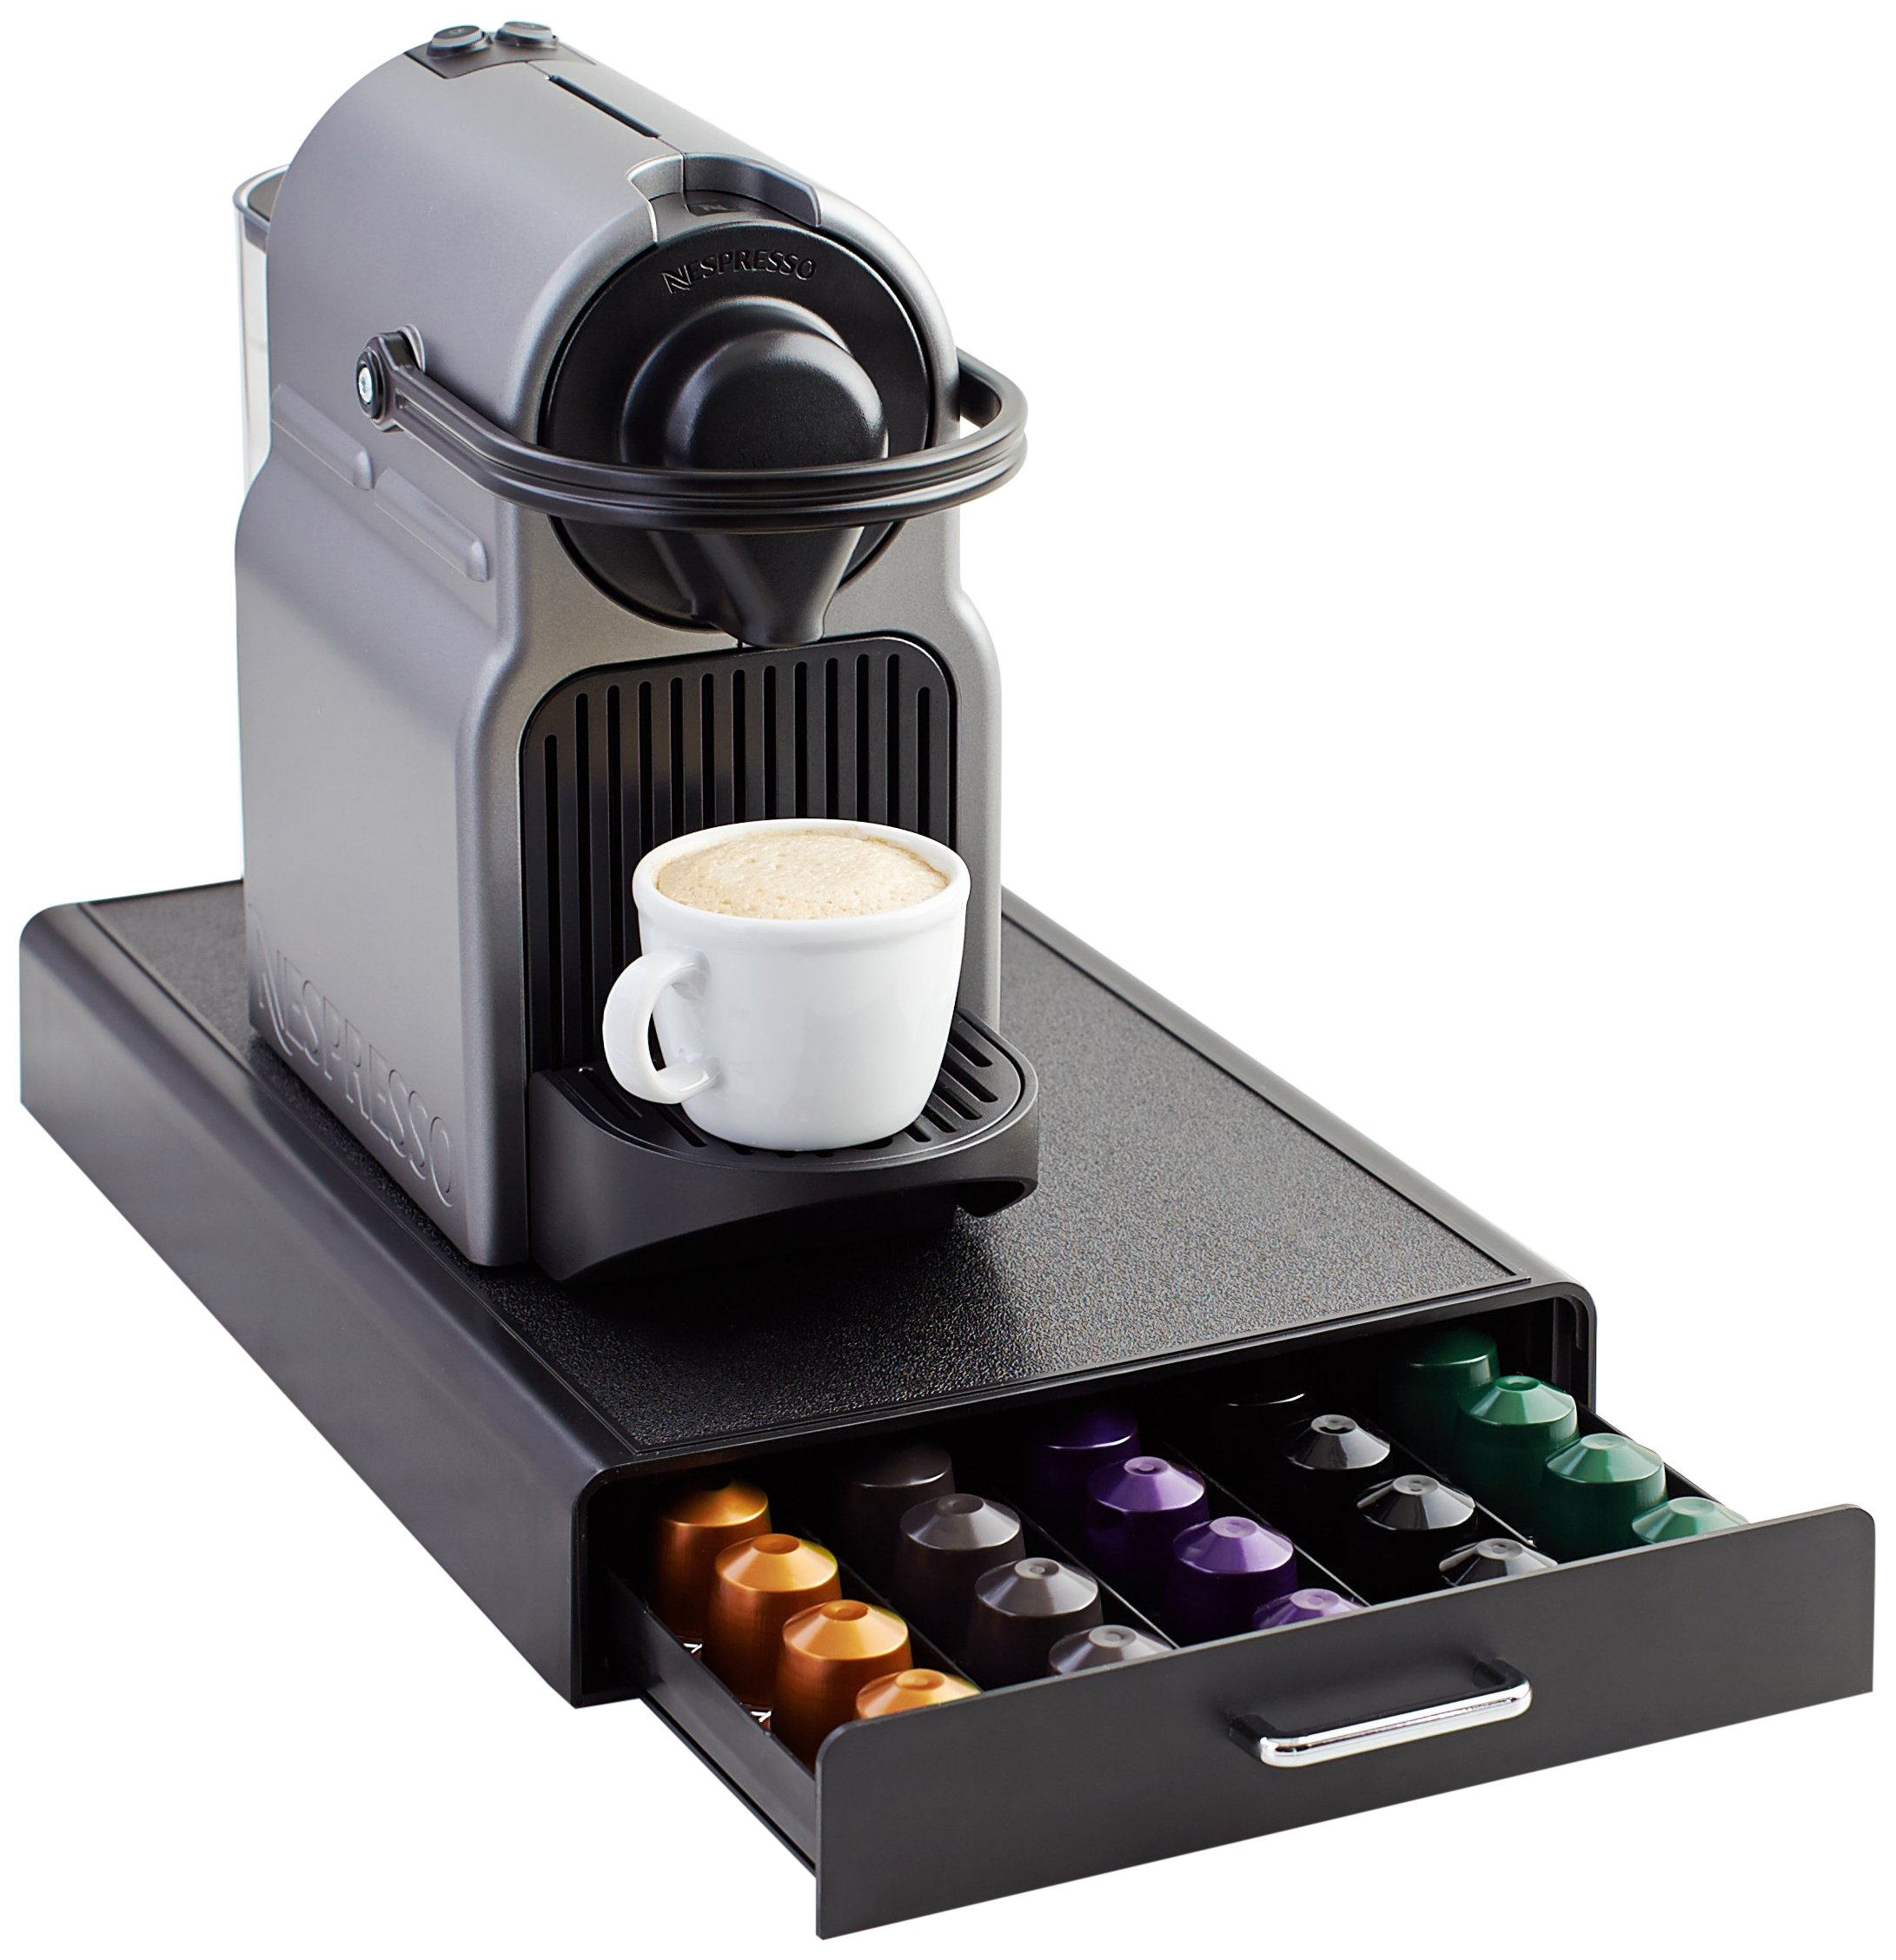 Amazon Basics Nespresso Coffee Pod Storage Drawer Holder, 50 Capsule Capacity